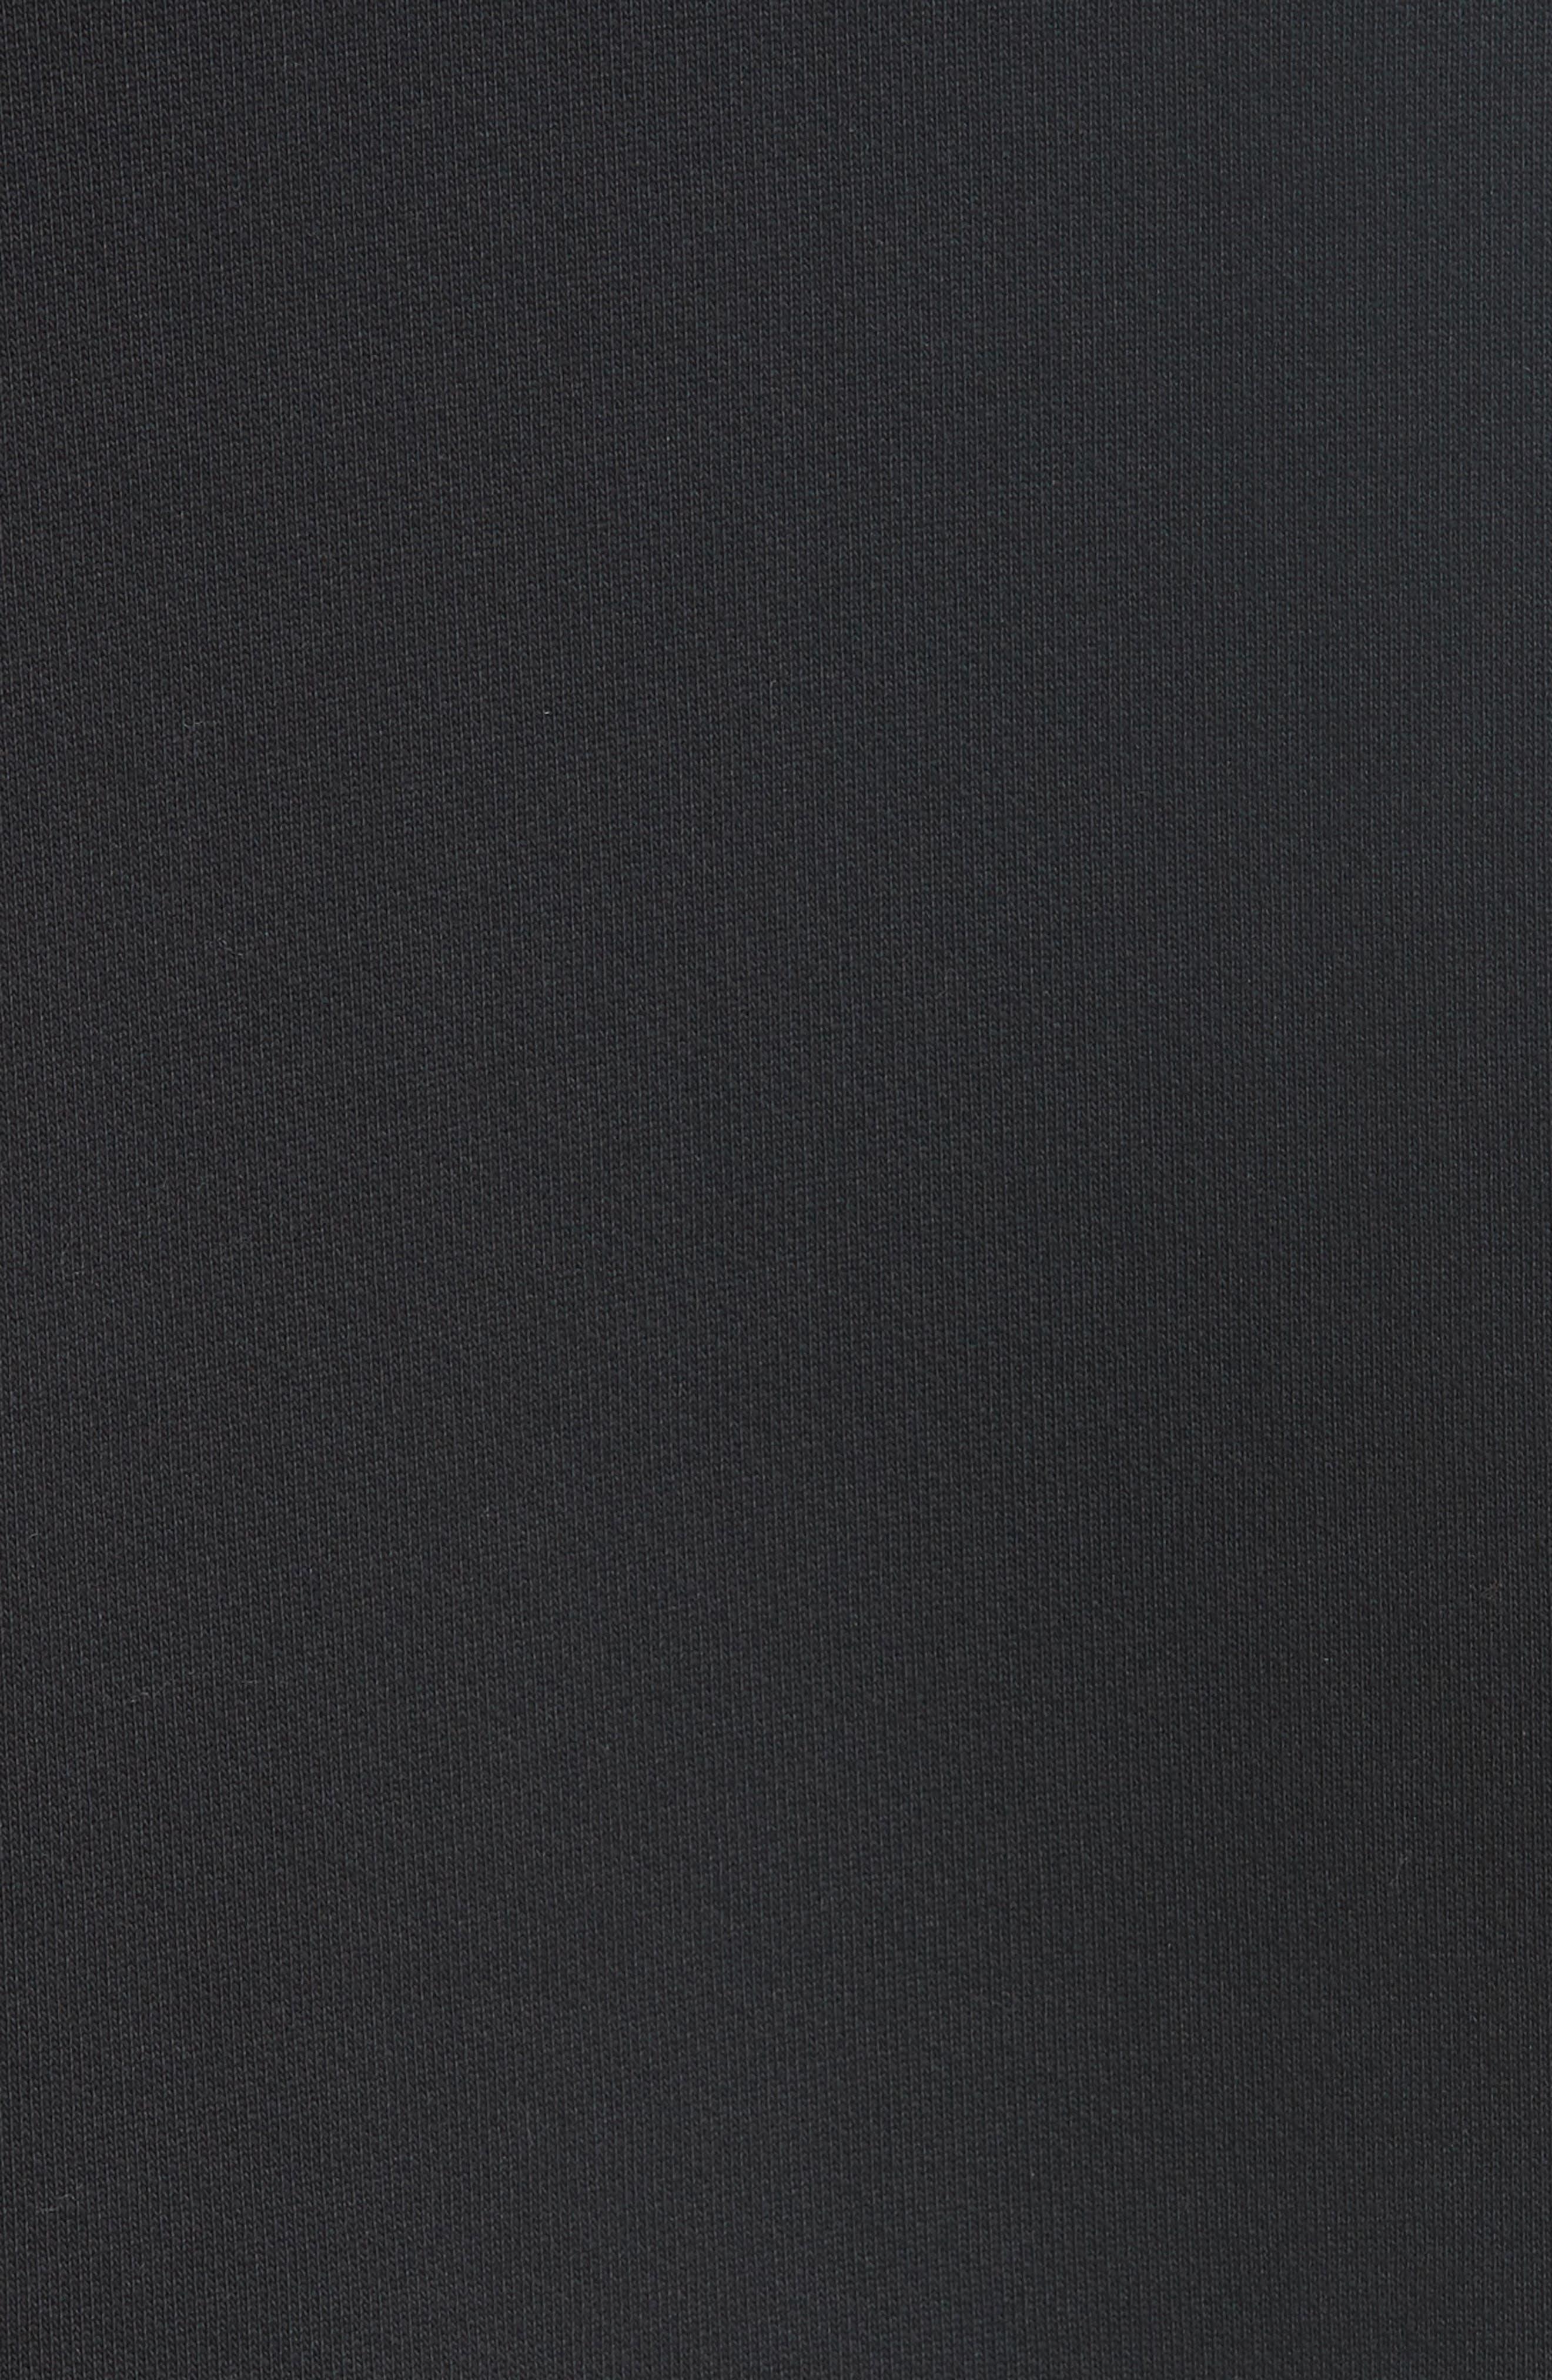 Foulard Sleeve Crewneck Sweatshirt,                             Alternate thumbnail 6, color,                             001